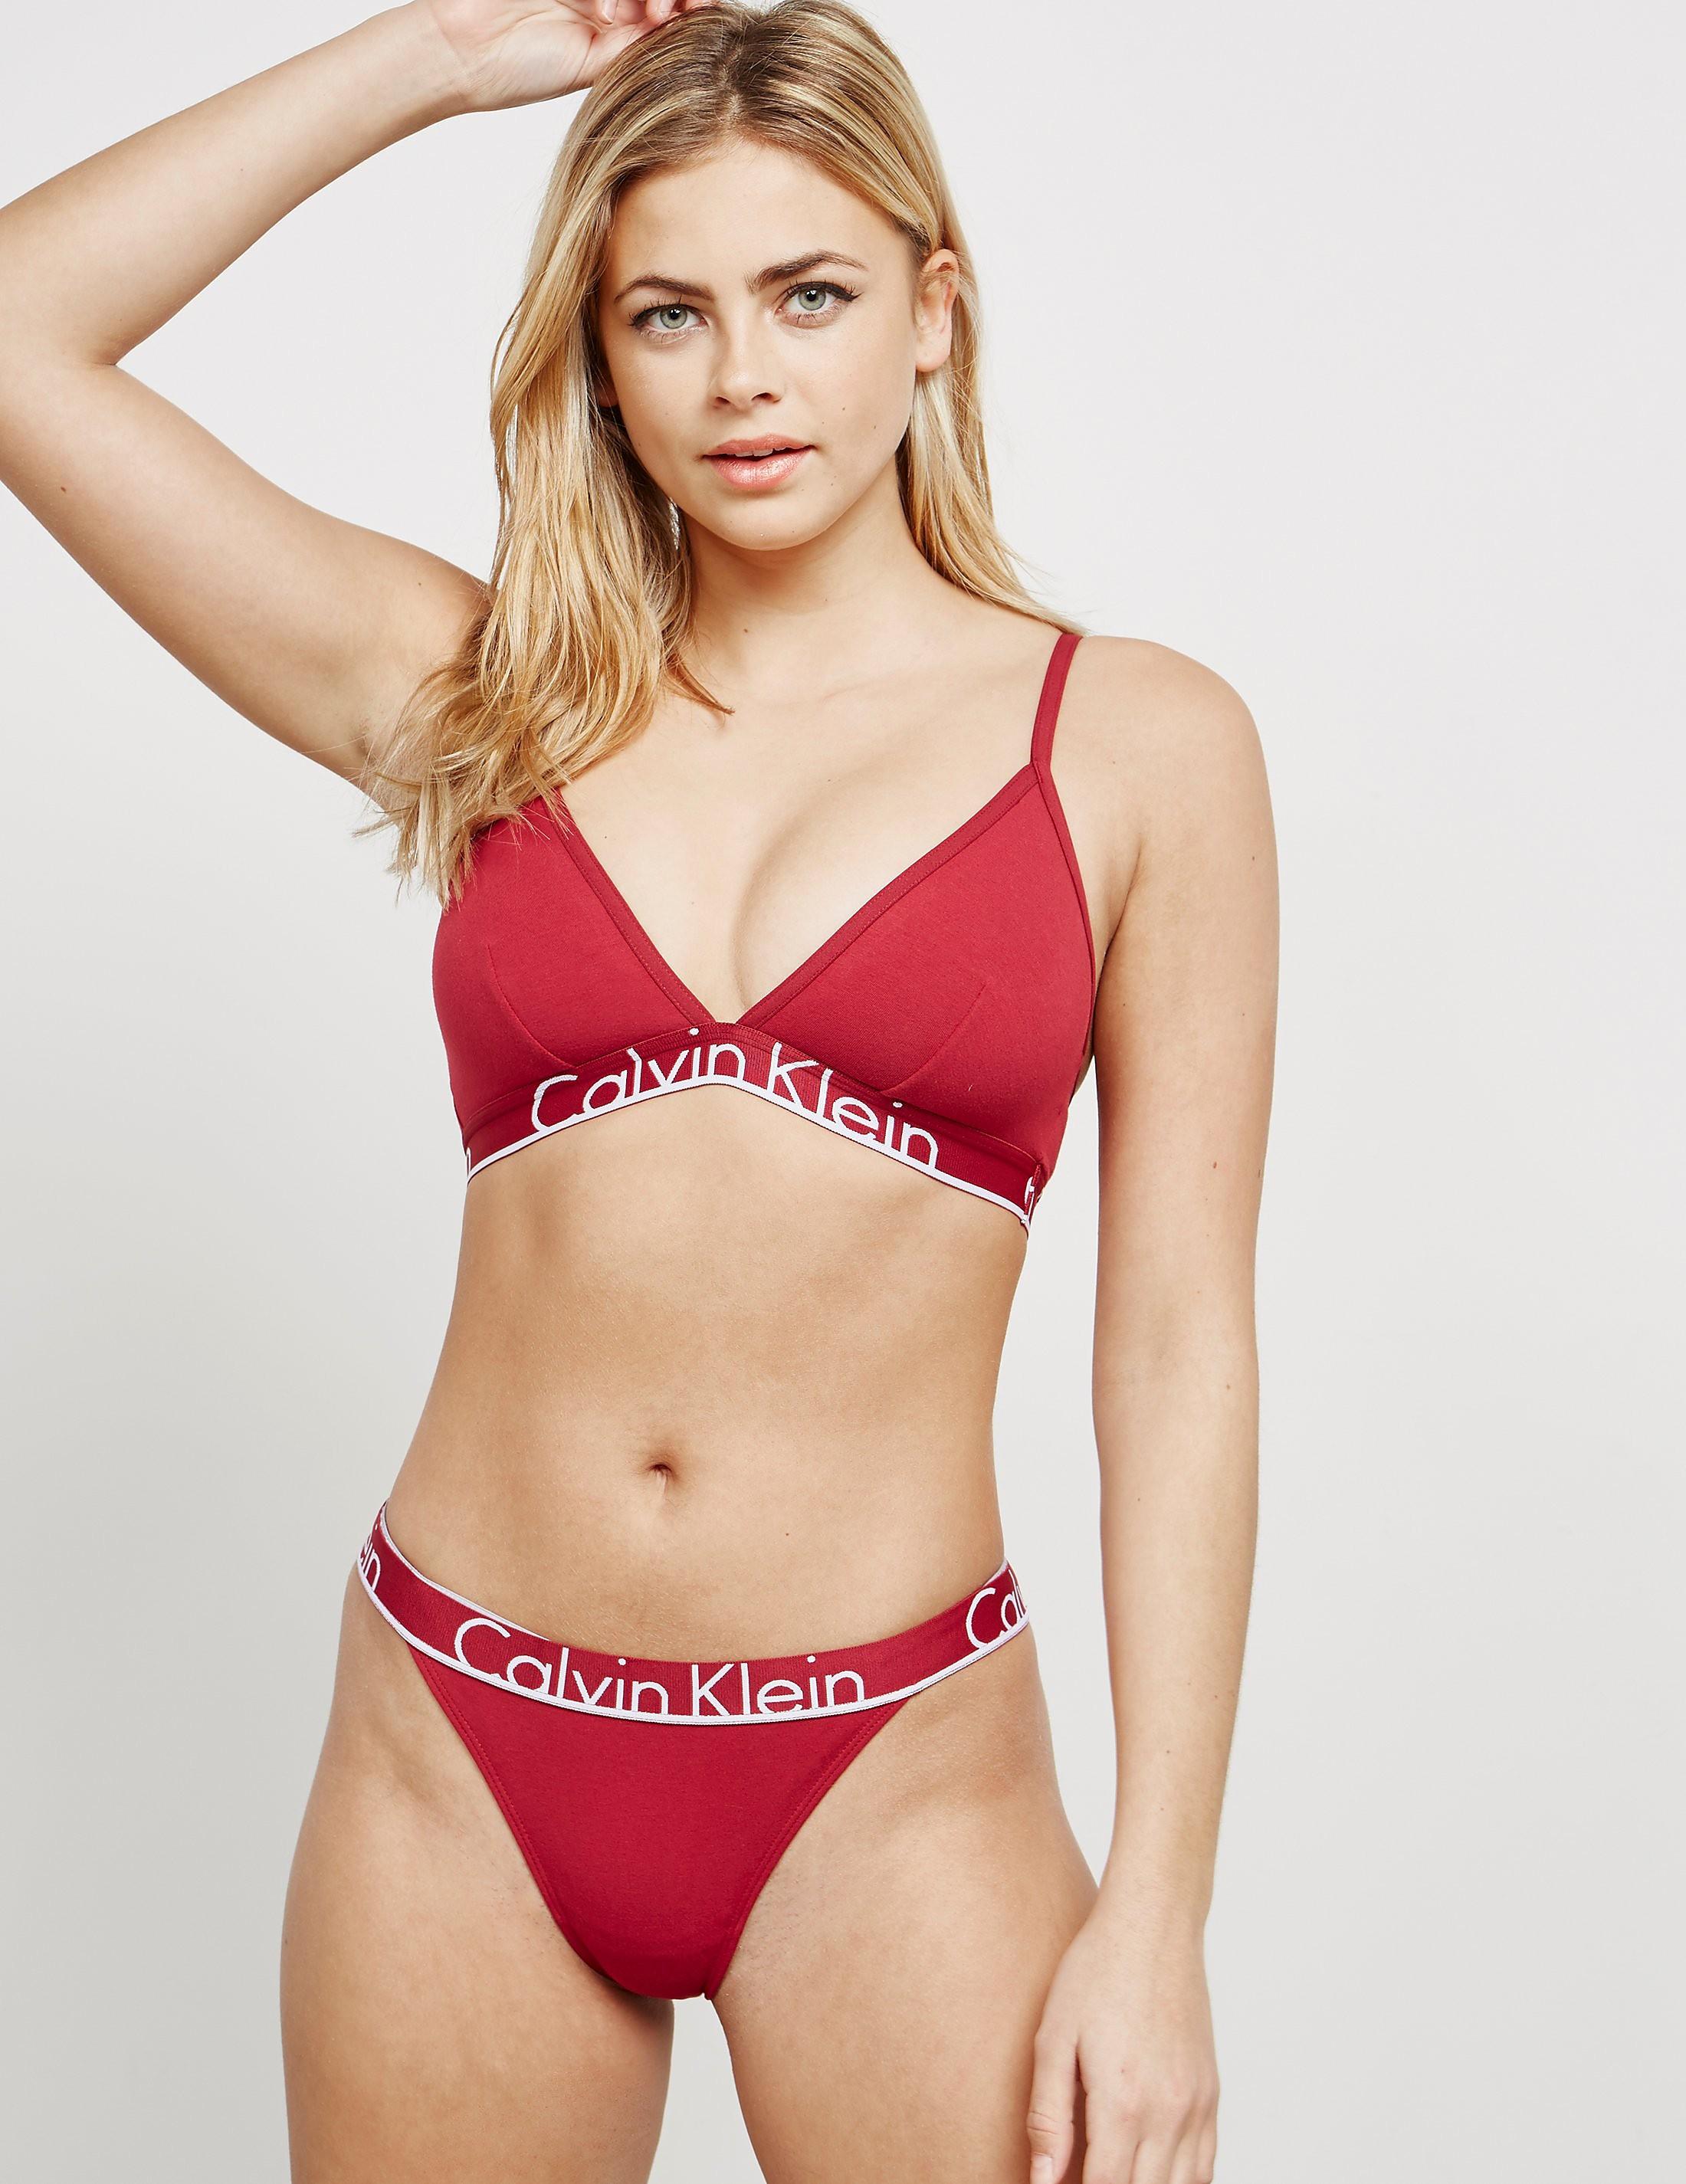 Calvin Klein Bra and Bikini Gift Set